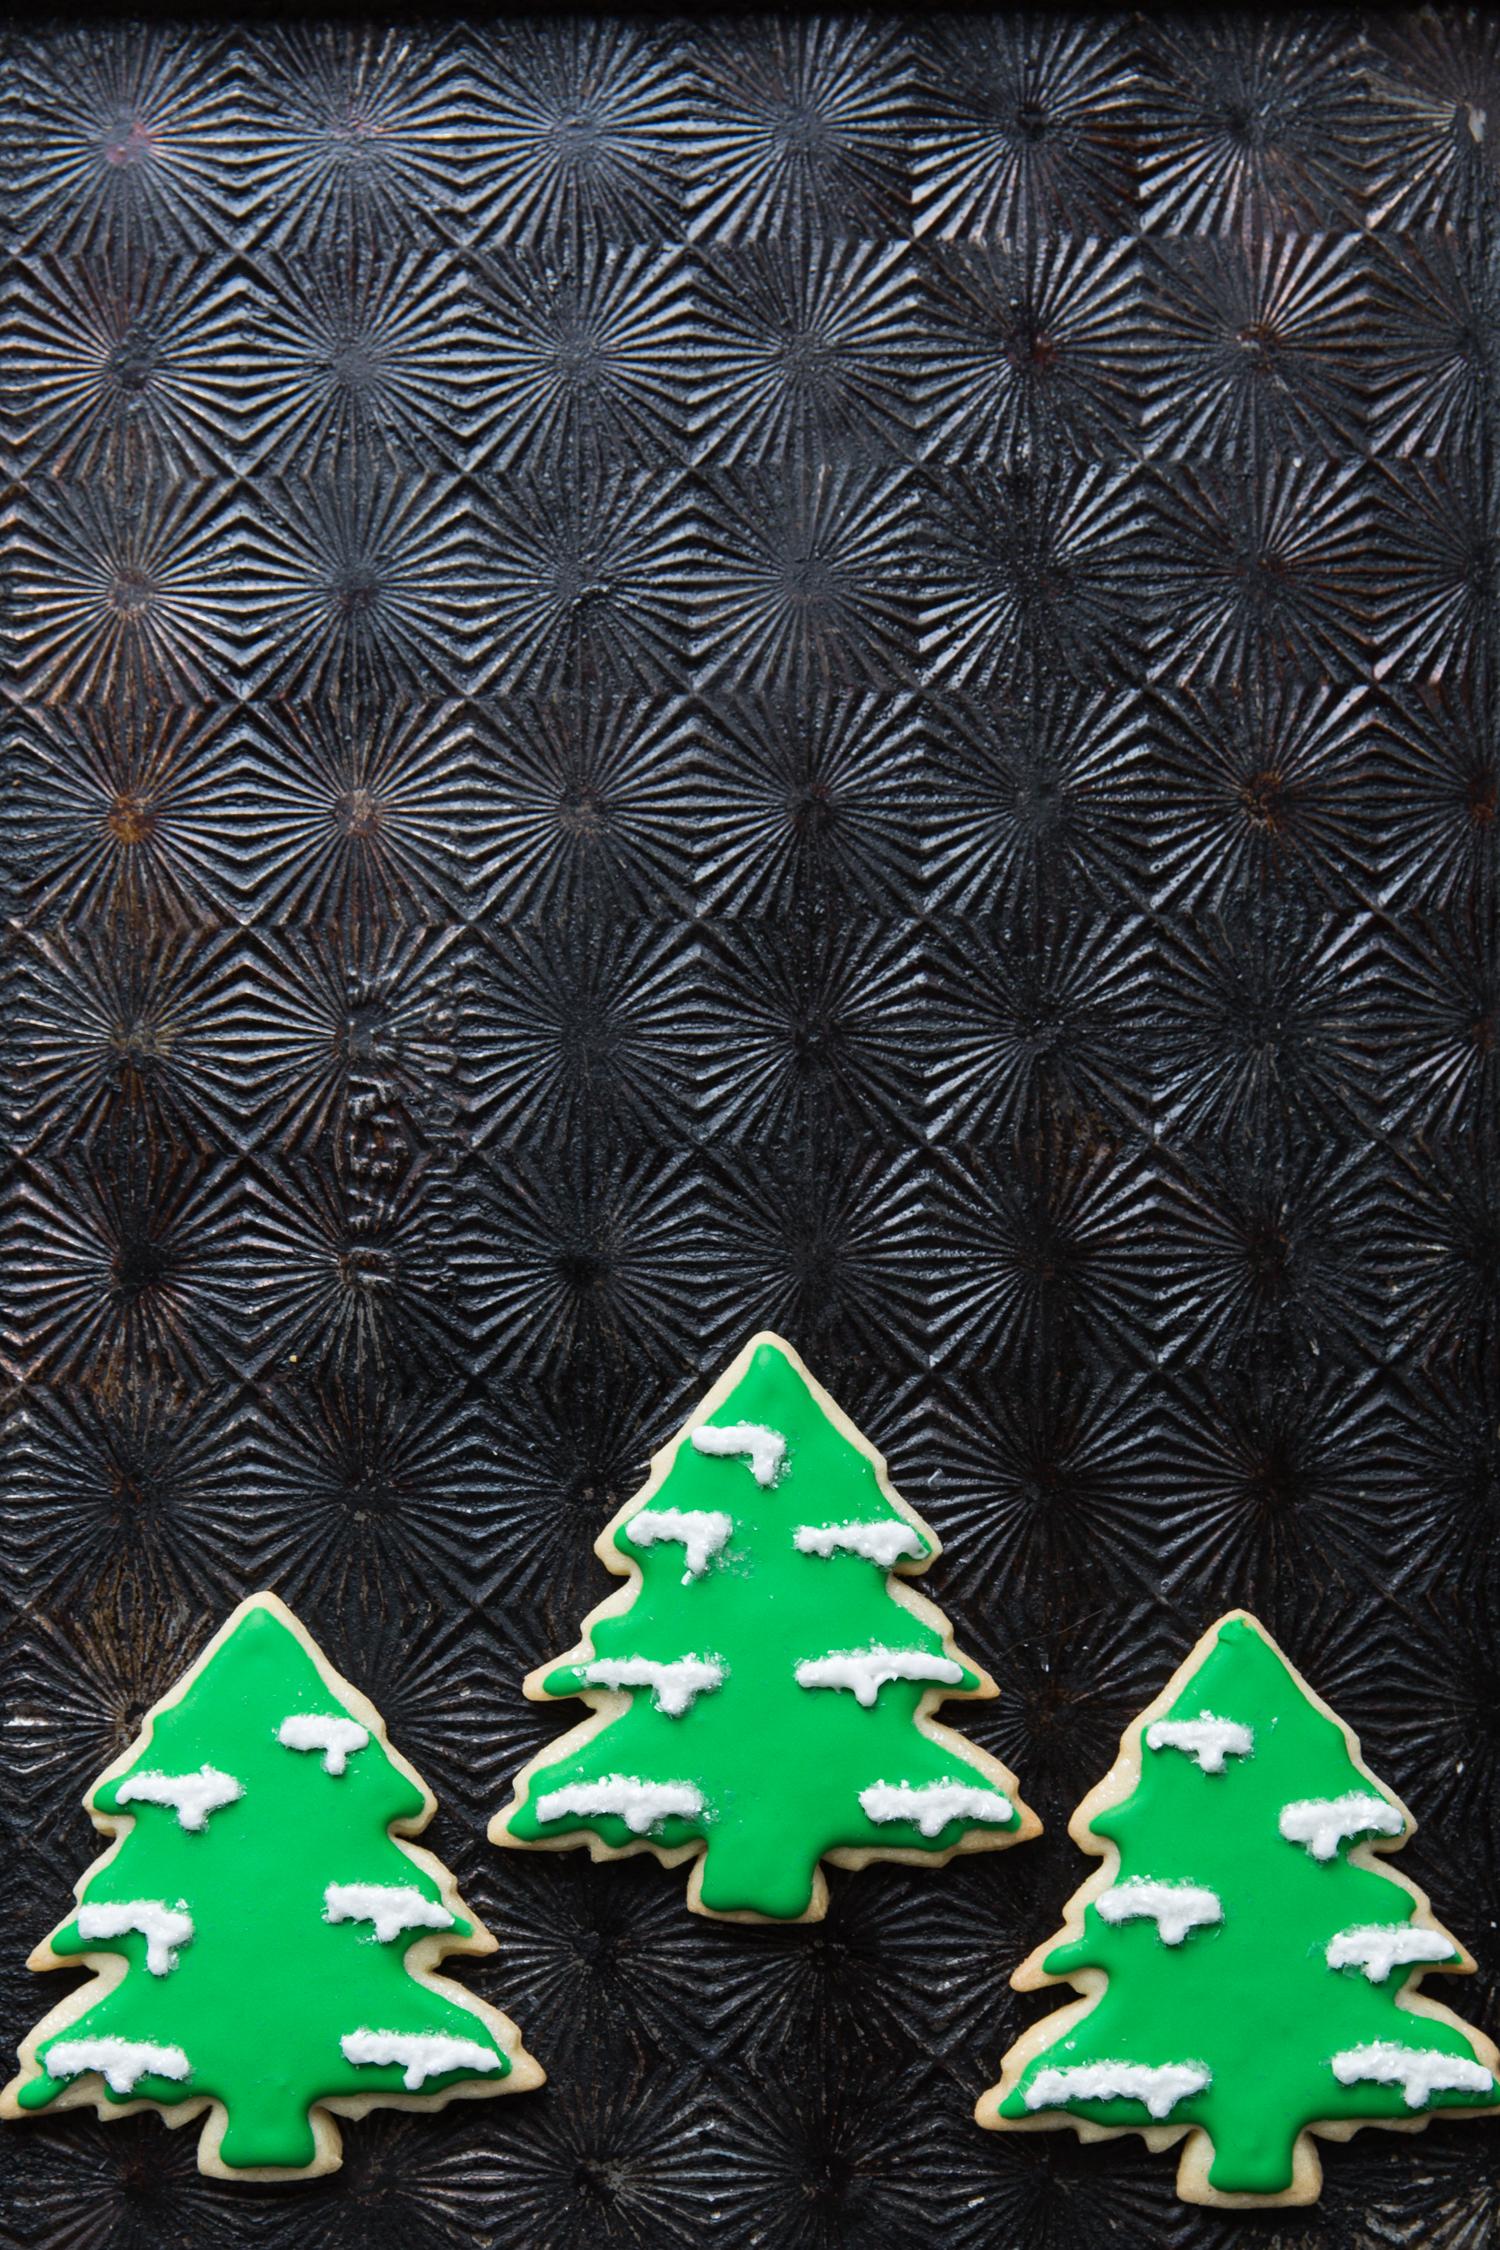 erinscottphotography_holidaycookies-43.jpg